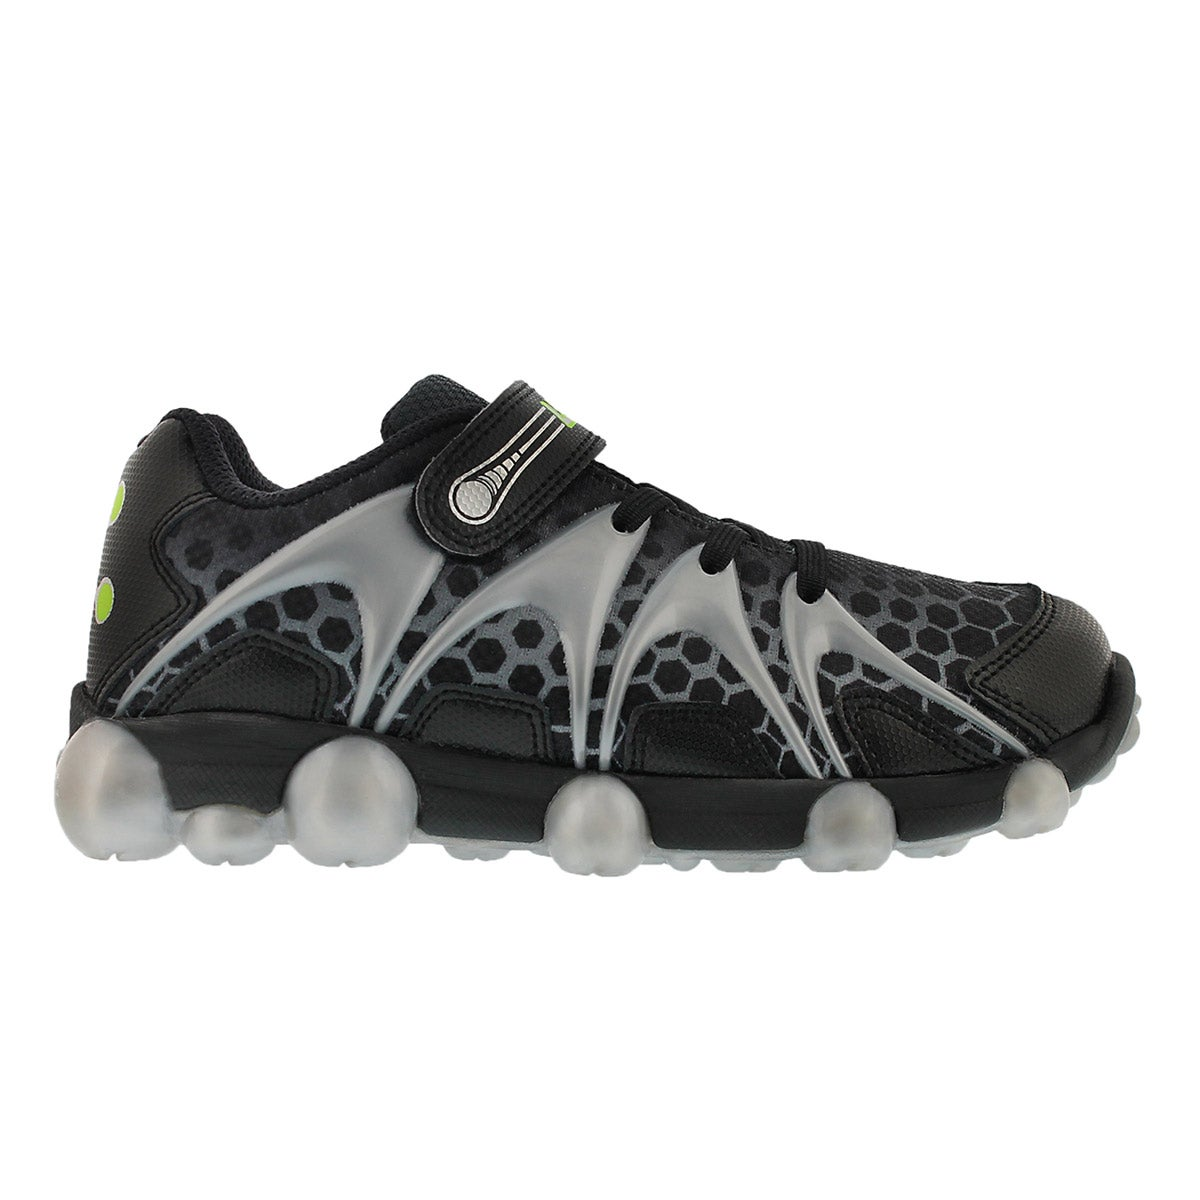 Bys Leepz blk/grey light up running shoe